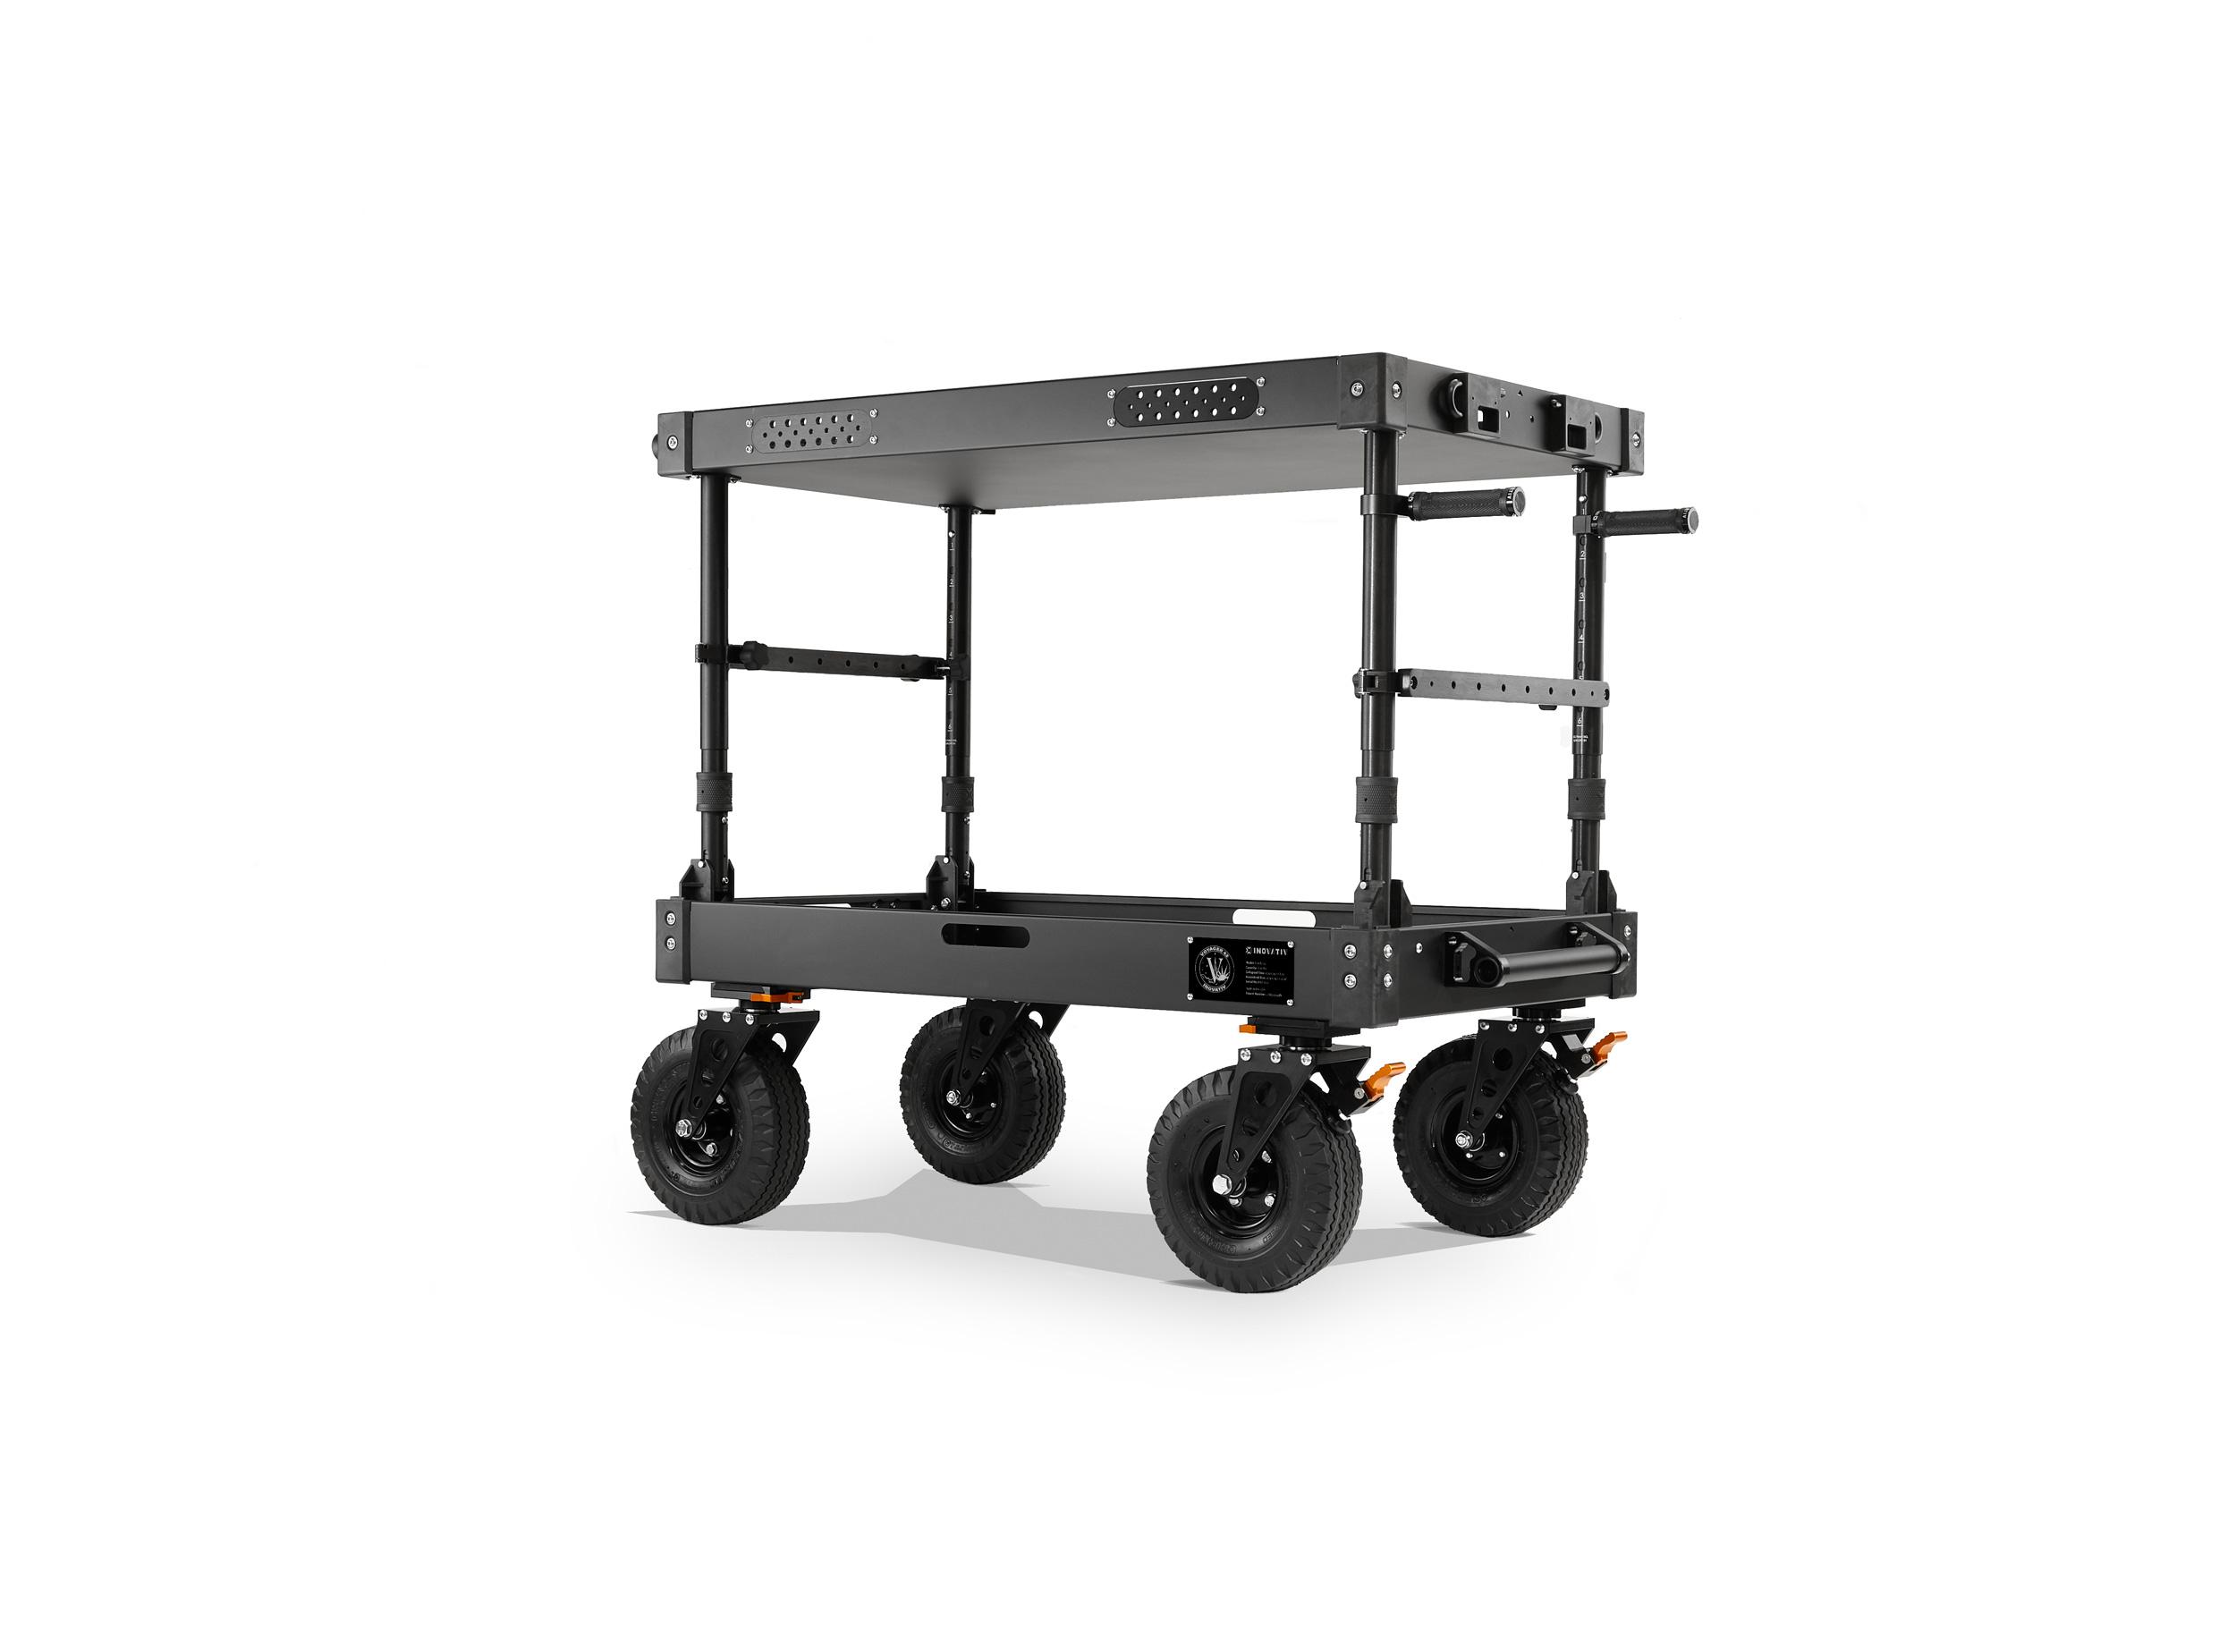 Voyager EVO cart